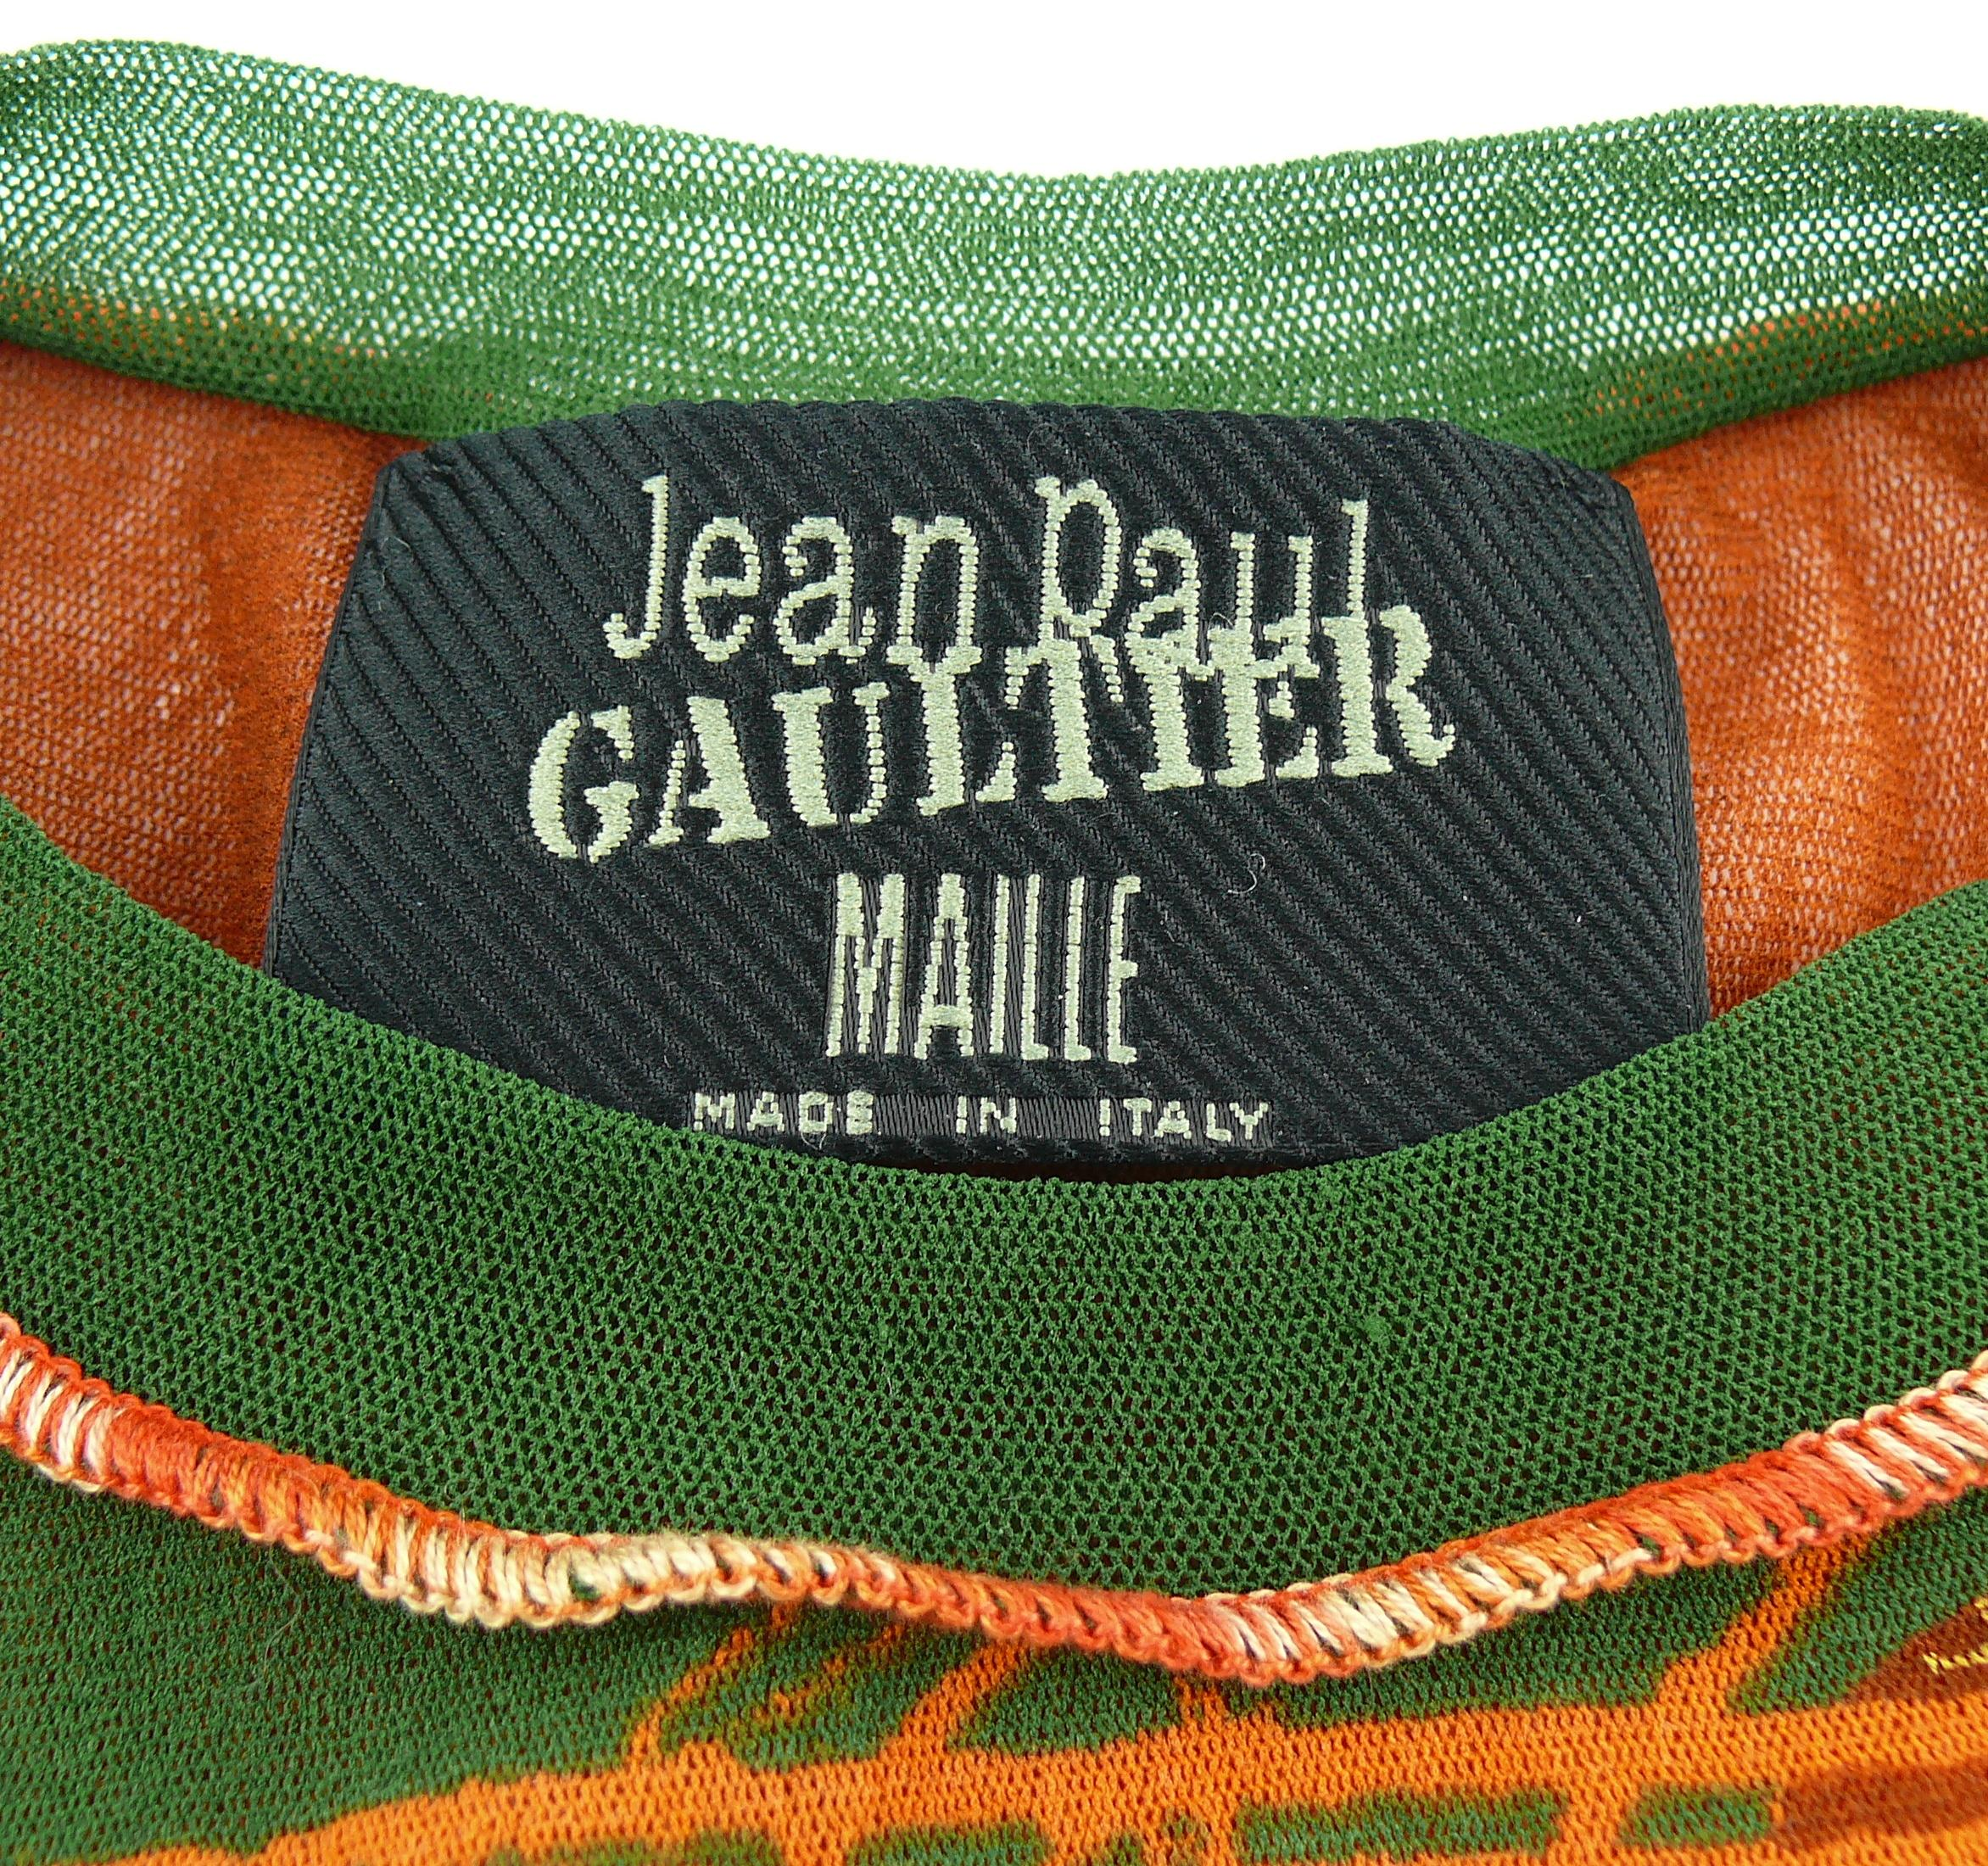 5eb1d0e81da Jean Paul Gaultier Vintage Venus de Milo Sheer Mesh Top Size S at 1stdibs